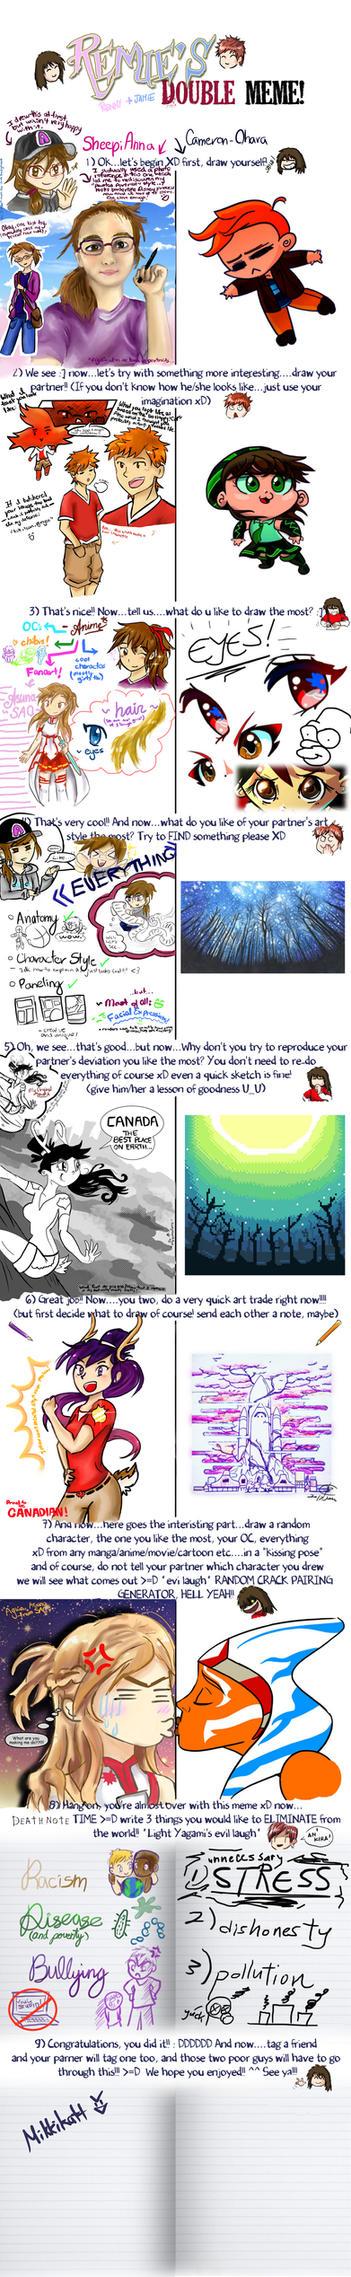 Remies Double Meme by Sheepianna and CameronOhara by Cameron-Ohara